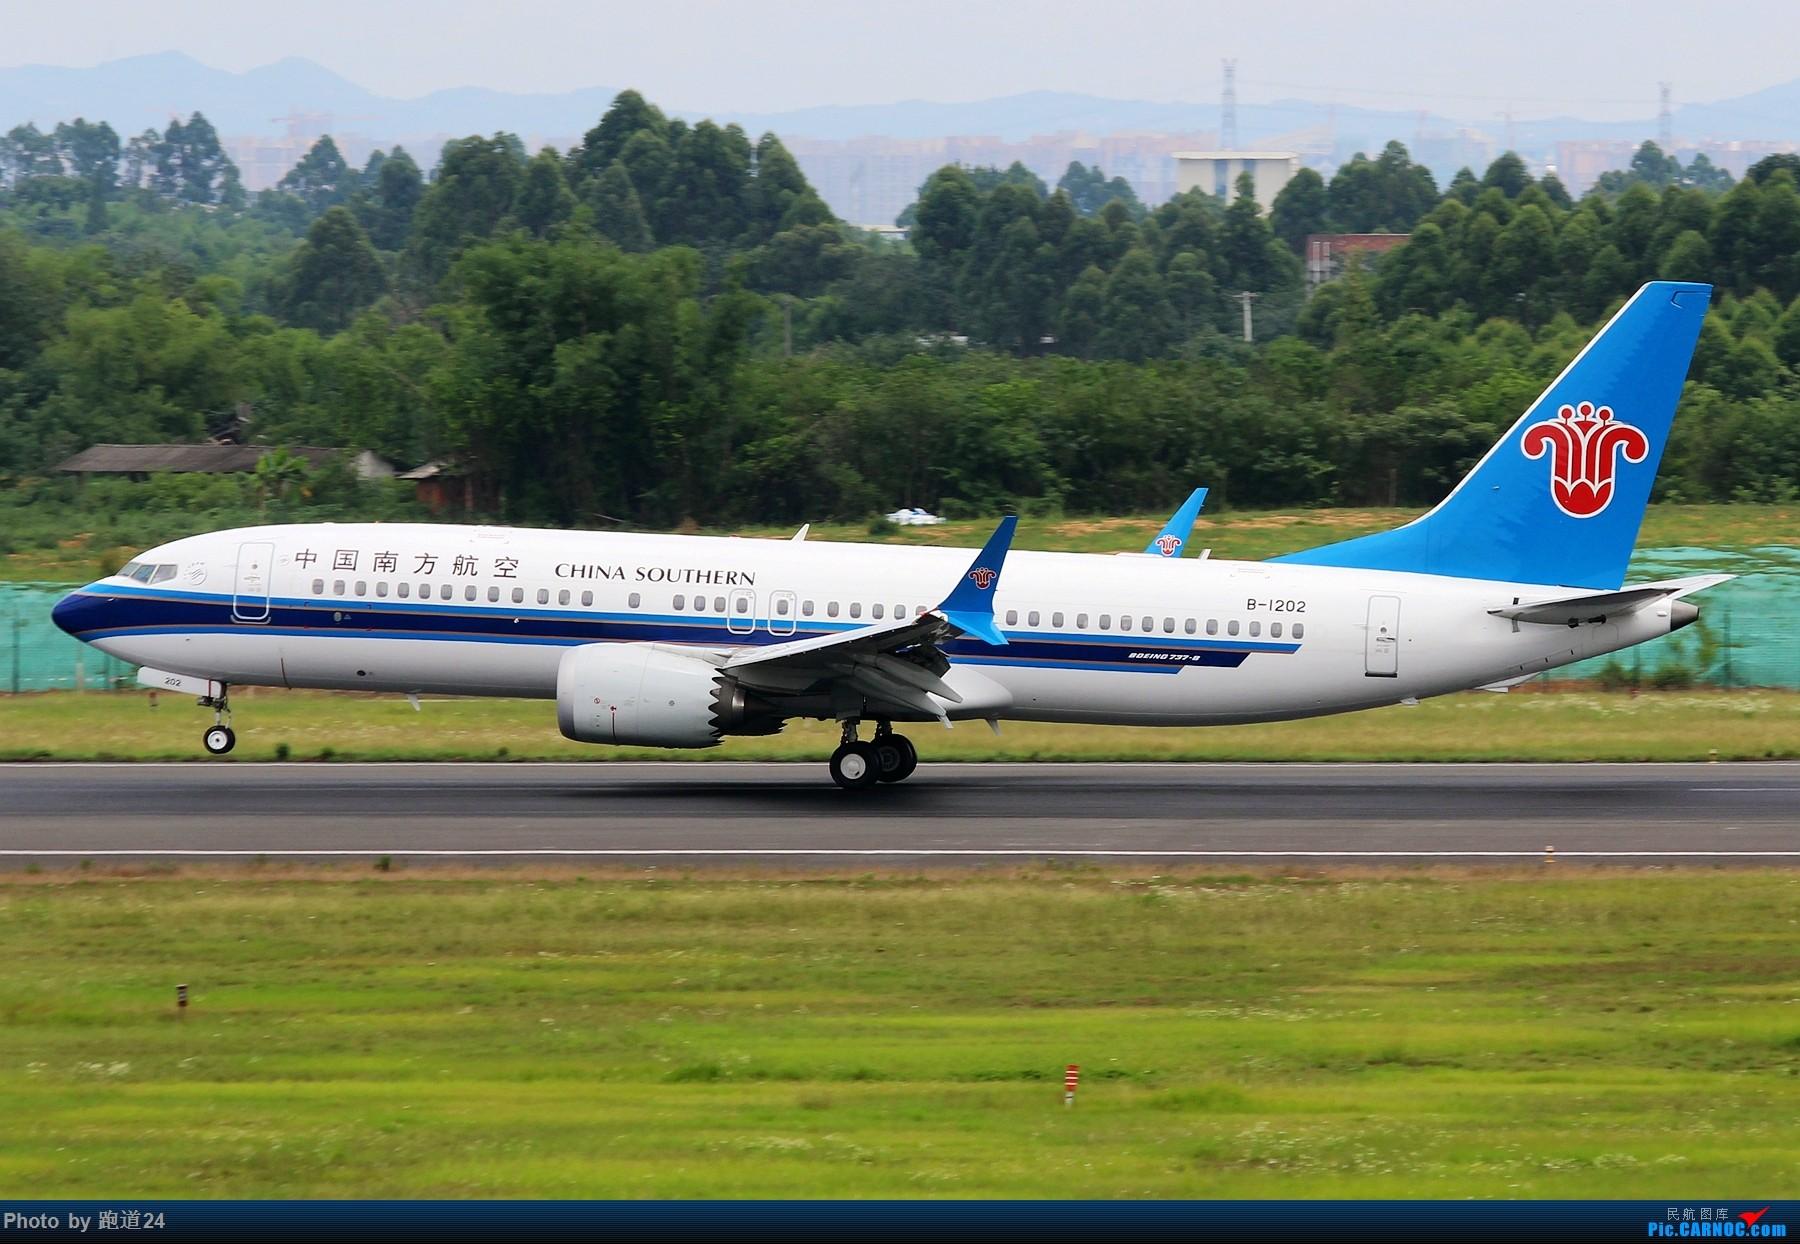 Re:[原创]【多图党】6月18日成都拍机【埃塞俄比亚航空B777-200LR】 BOEING 737MAX-8 B-1202 中国成都双流国际机场